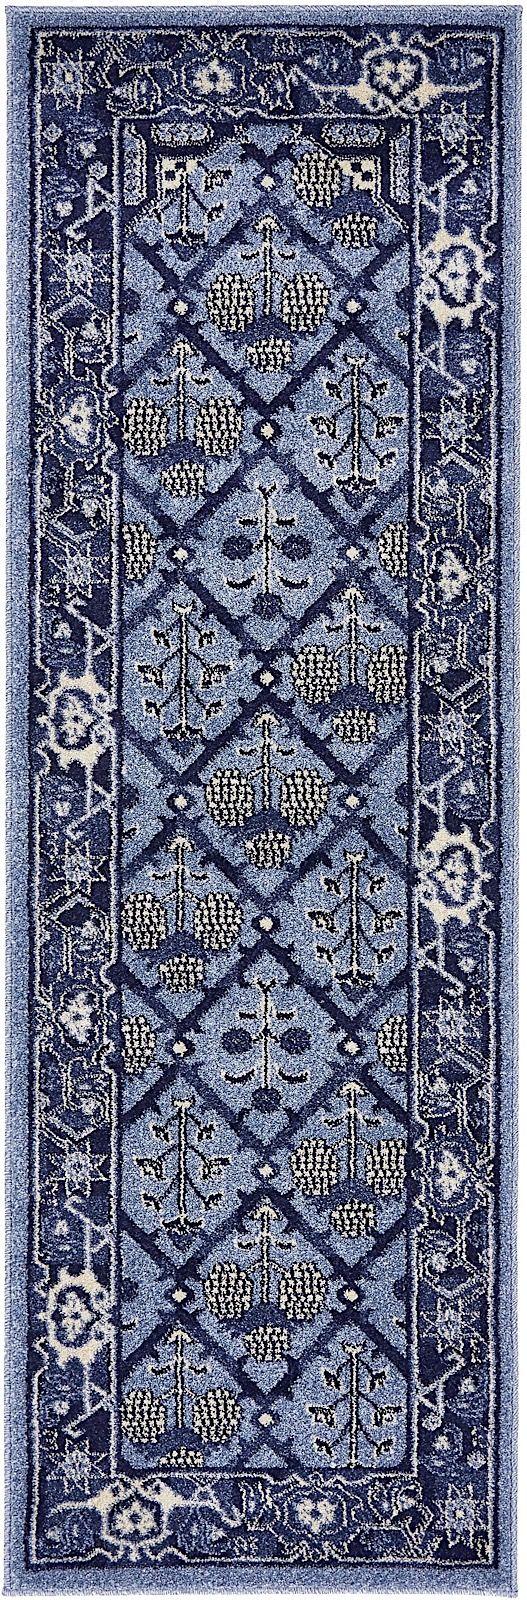 rugpal soledad traditional area rug collection